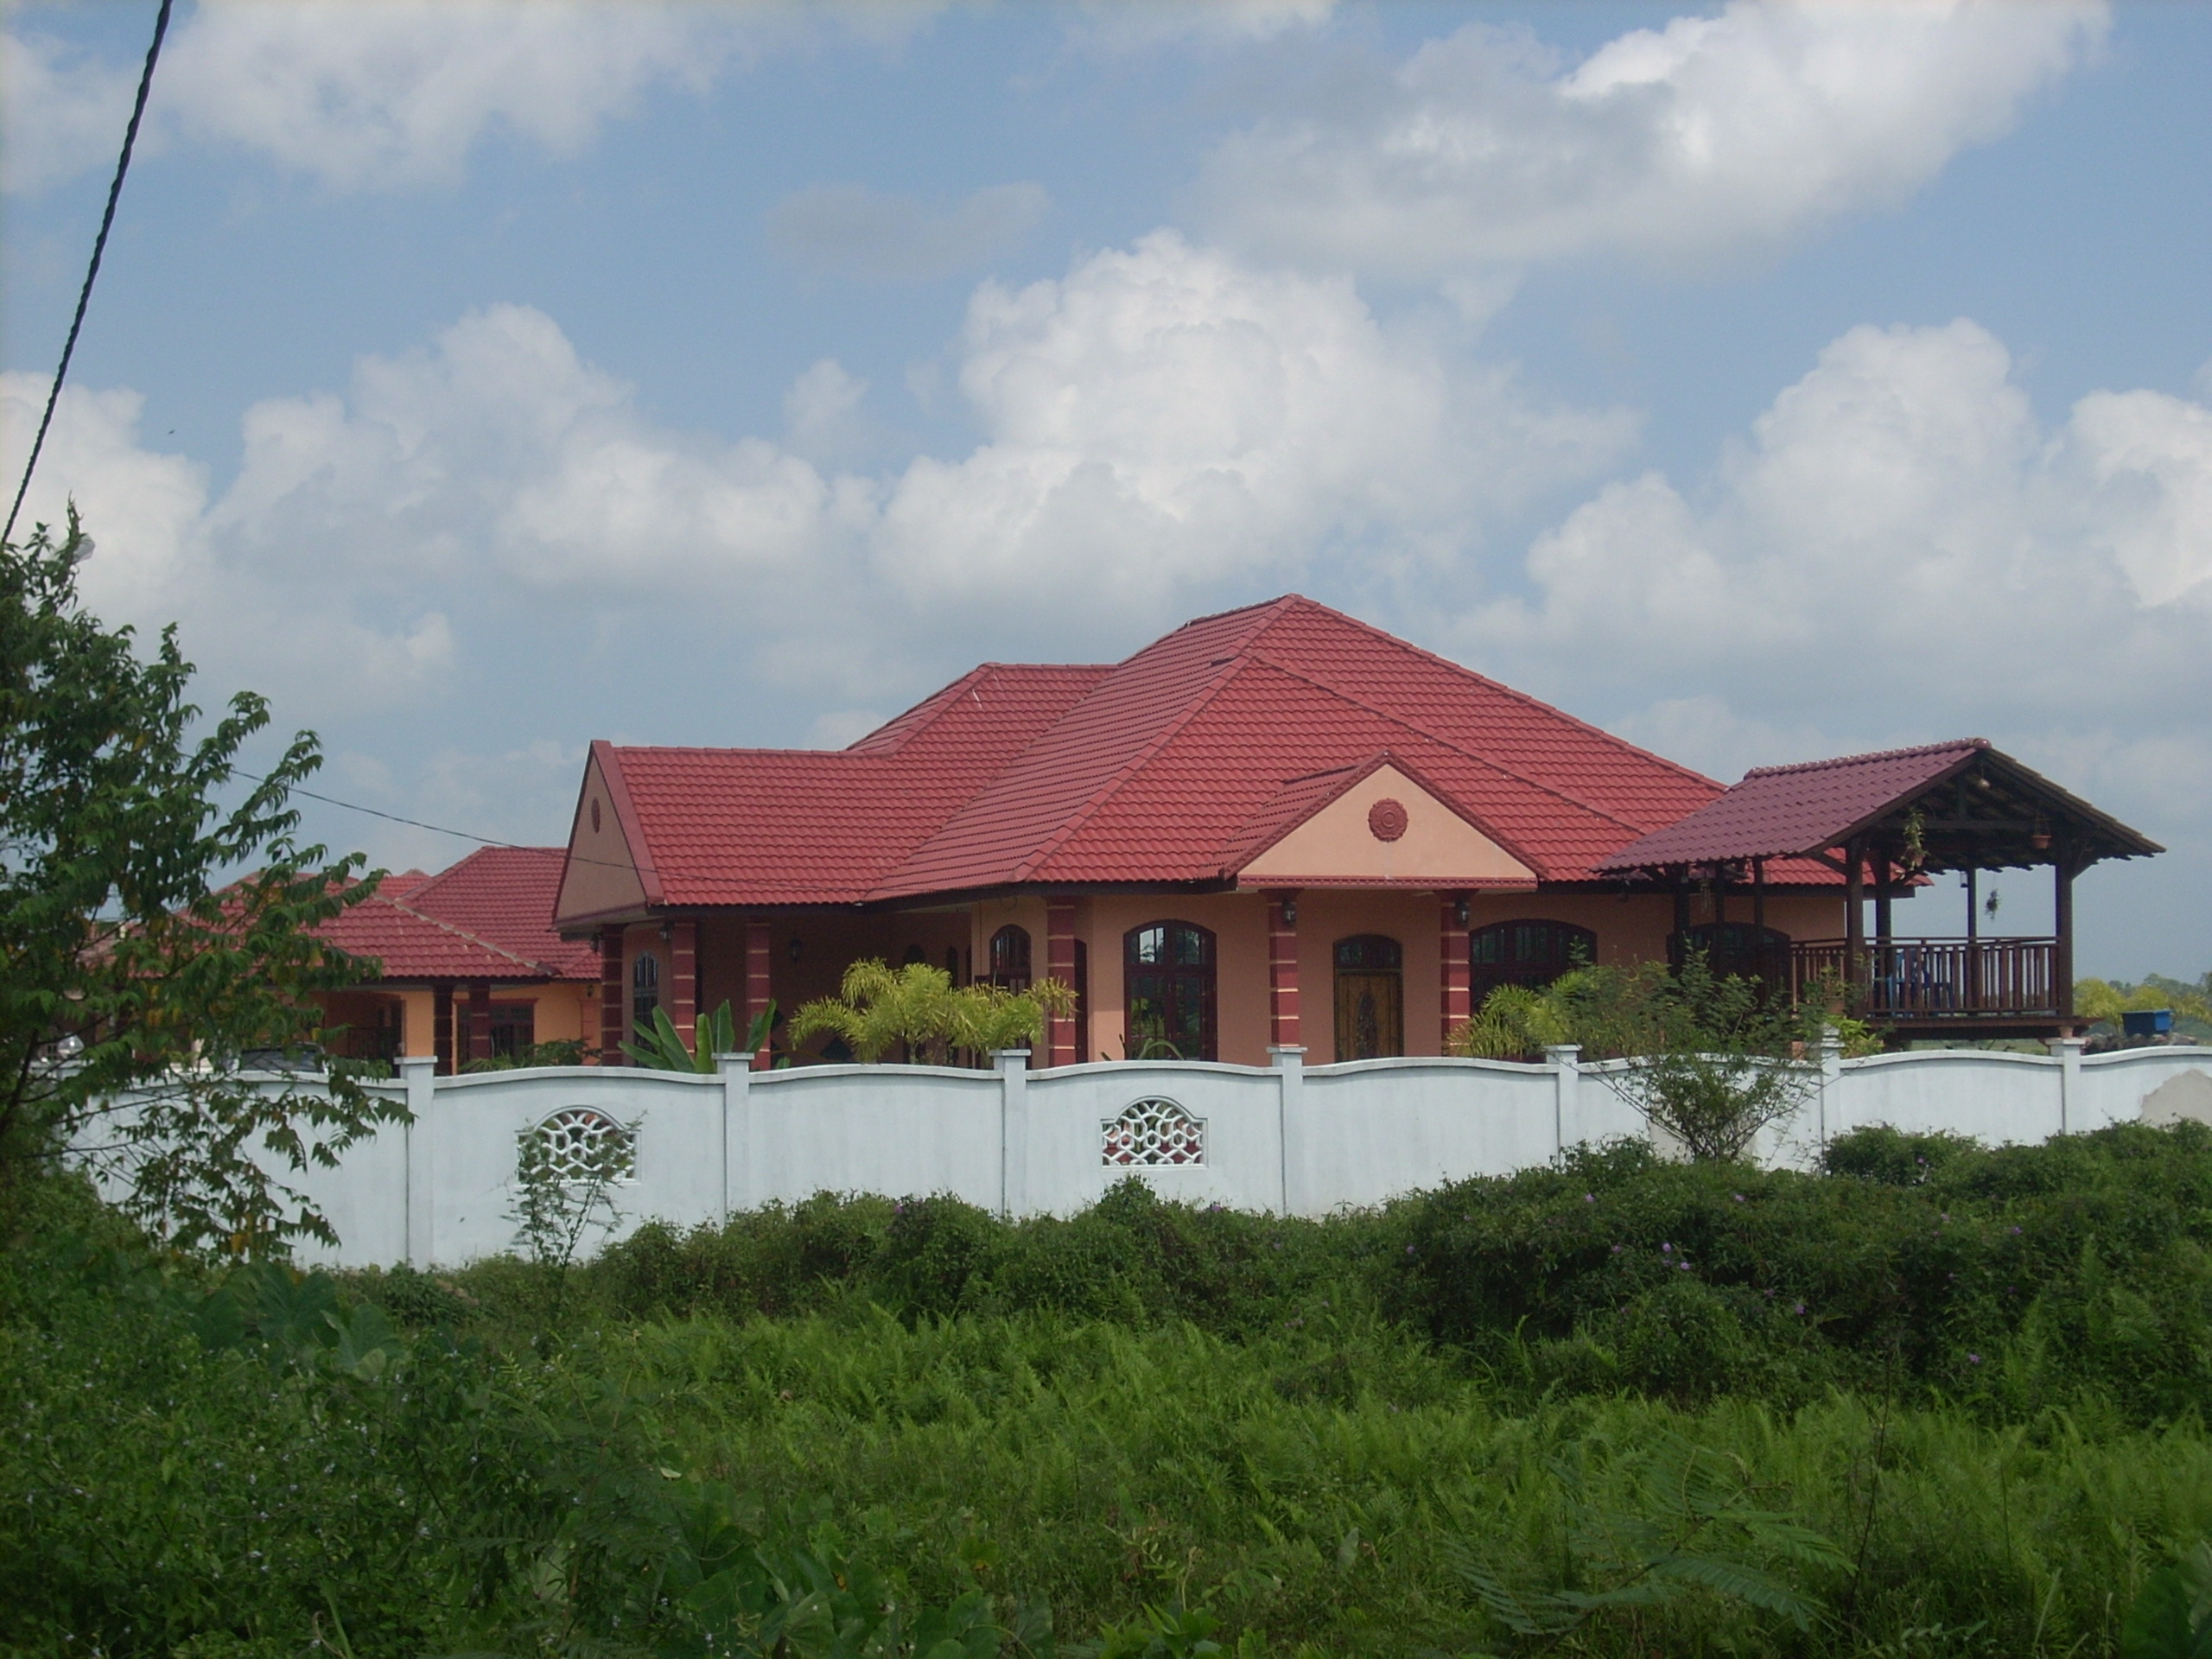 Reka Bentuk Rumah Banglo http://bundesfirmenanzeiger.de/21/bentuk